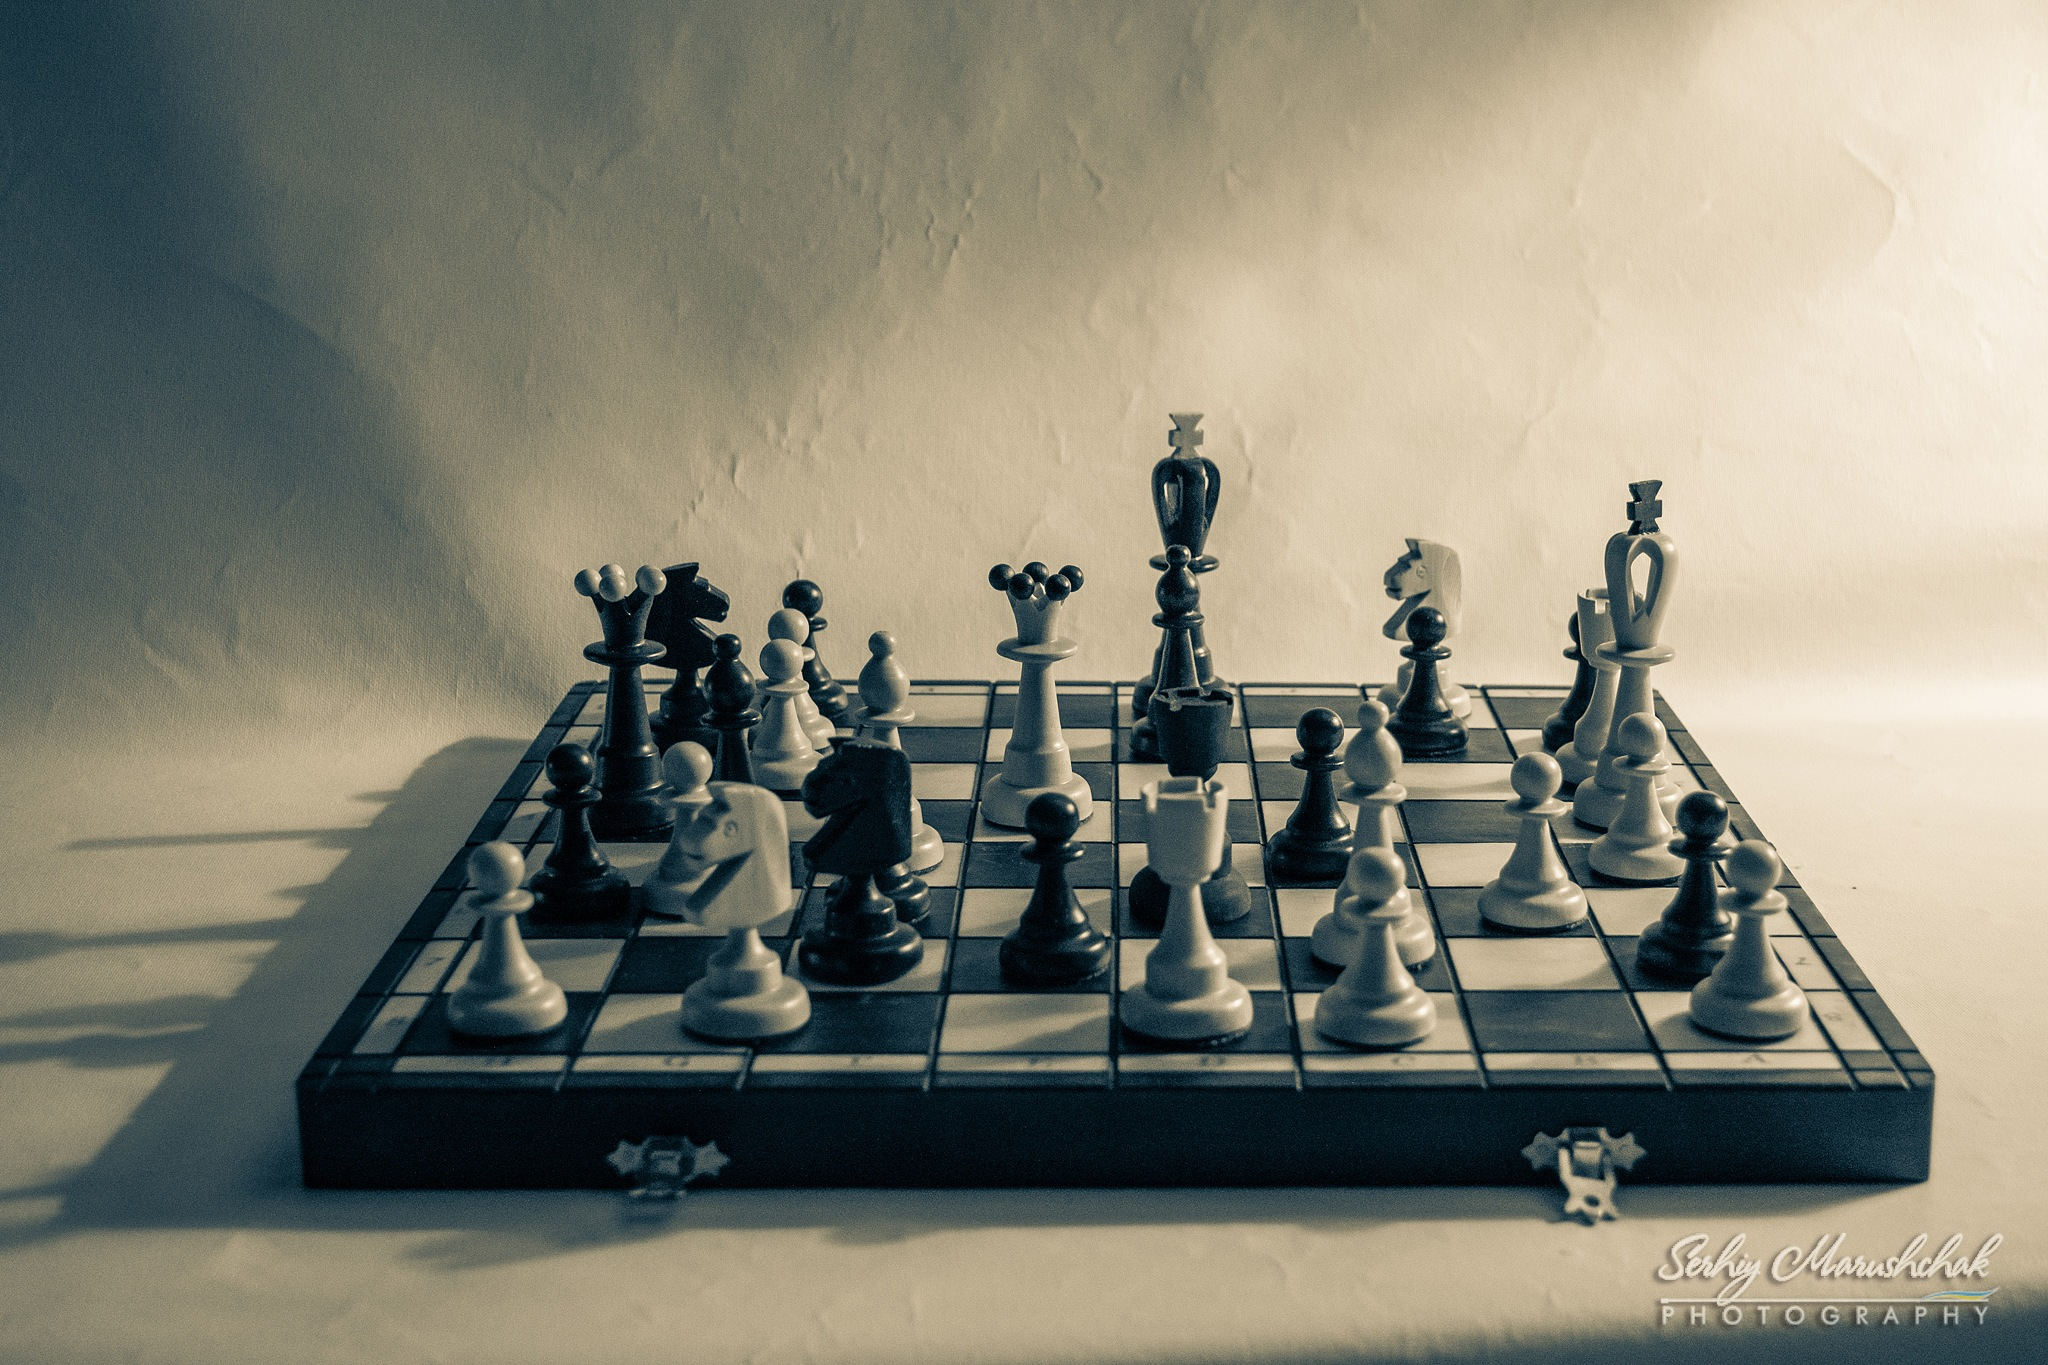 Шахова комбінація... / Chess combination... by artmars07